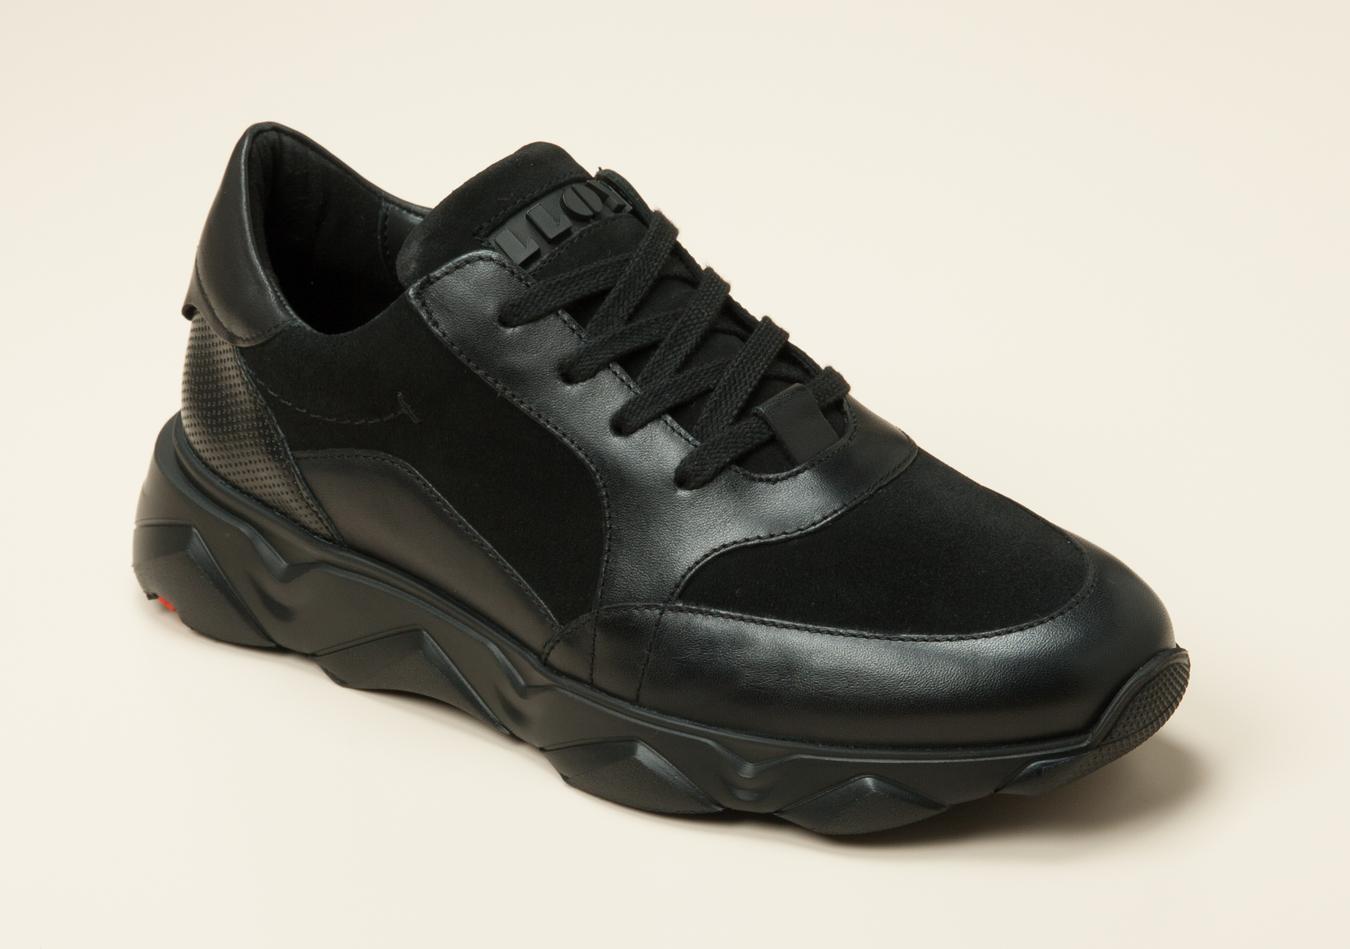 Schwarz Shop Online Sneaker KaufenZumnorde Lloyd In Herren xoedCB